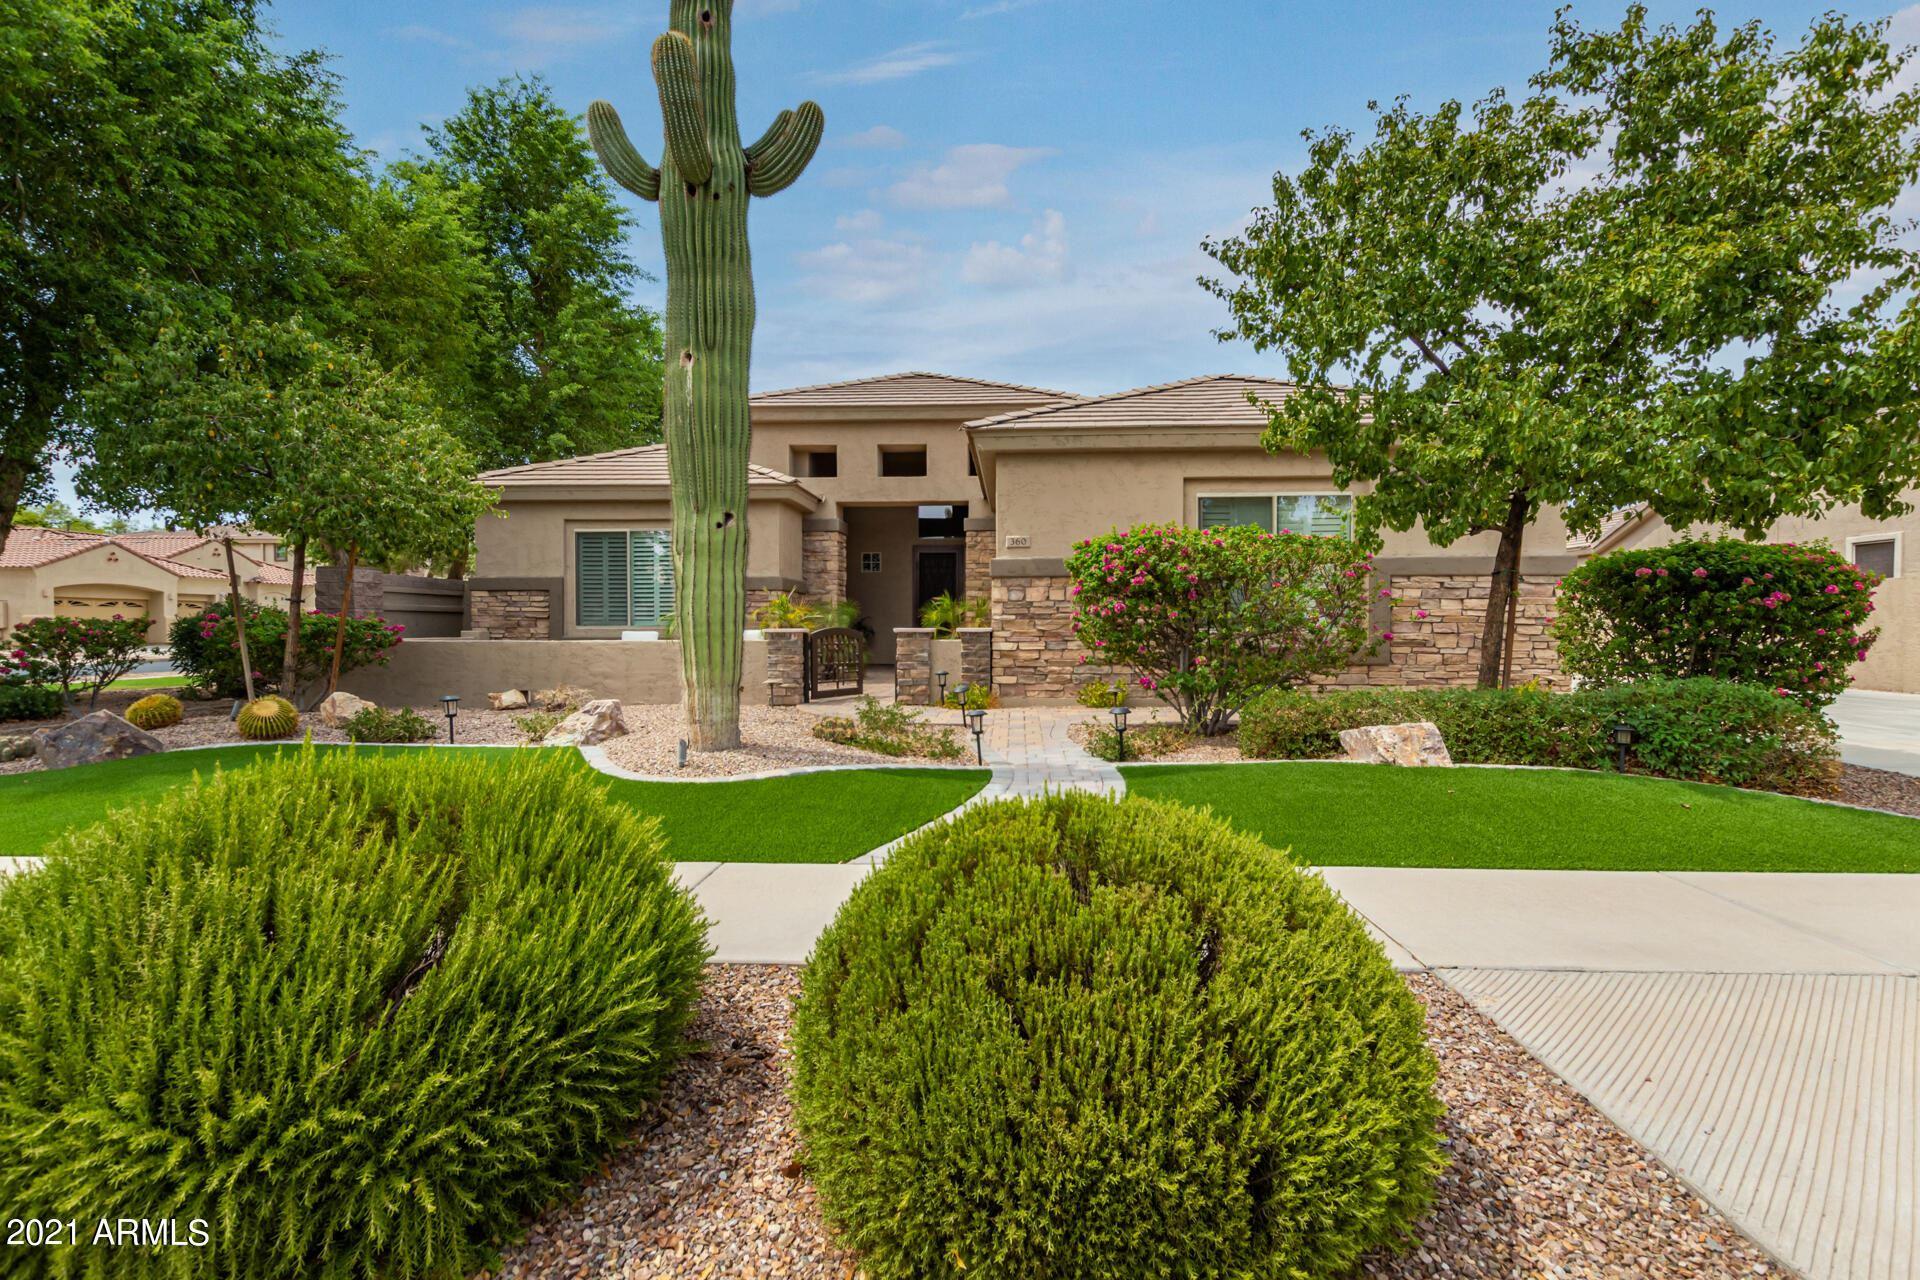 360 W SPARROW Drive, Chandler, AZ 85286 - MLS#: 6268285